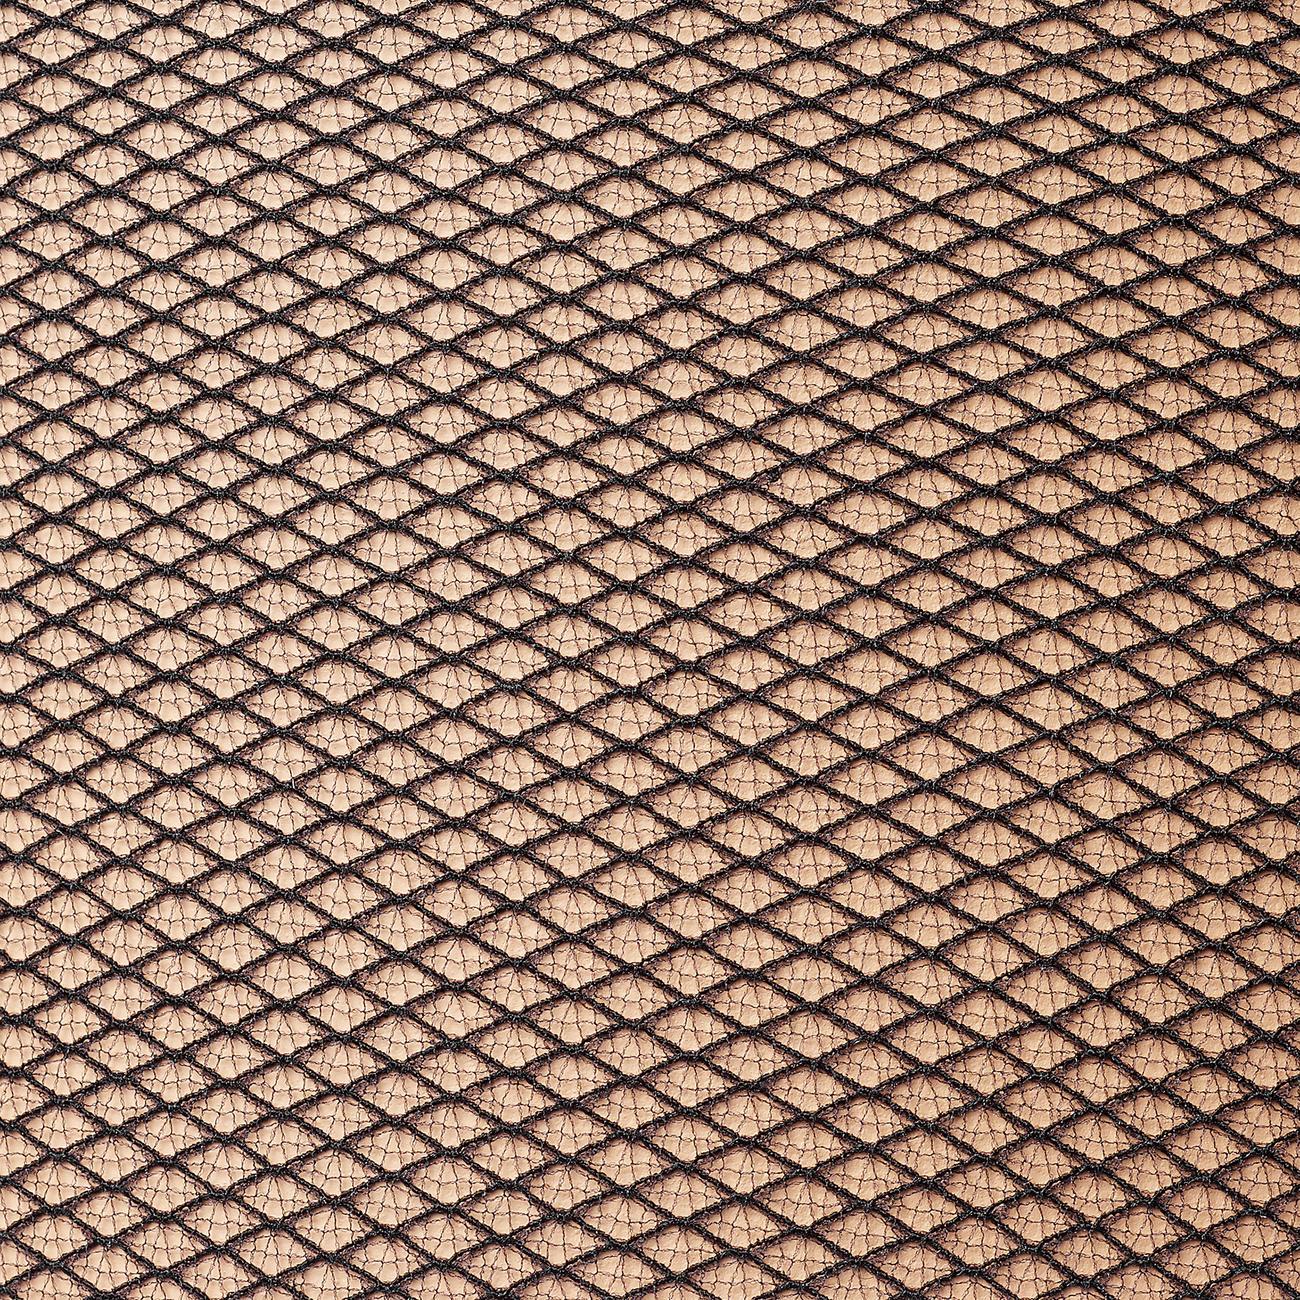 Fein-Netzstrumpfhose, 38/40 - Schwarz